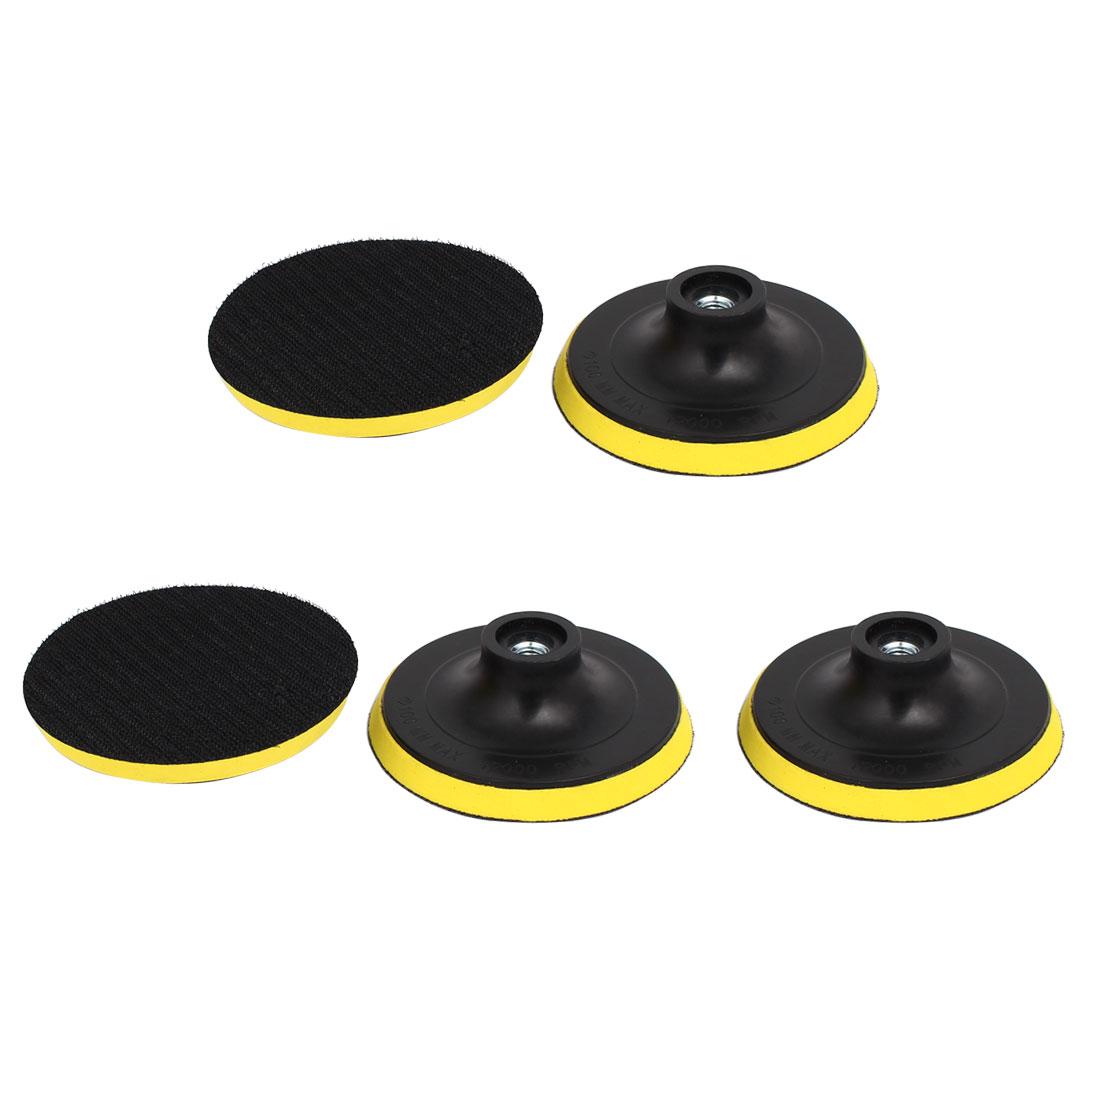 "100mm 4"" Dia M10 Female Thread Sanding Polishing Backer Pad Buffer Wheel 5pcs"